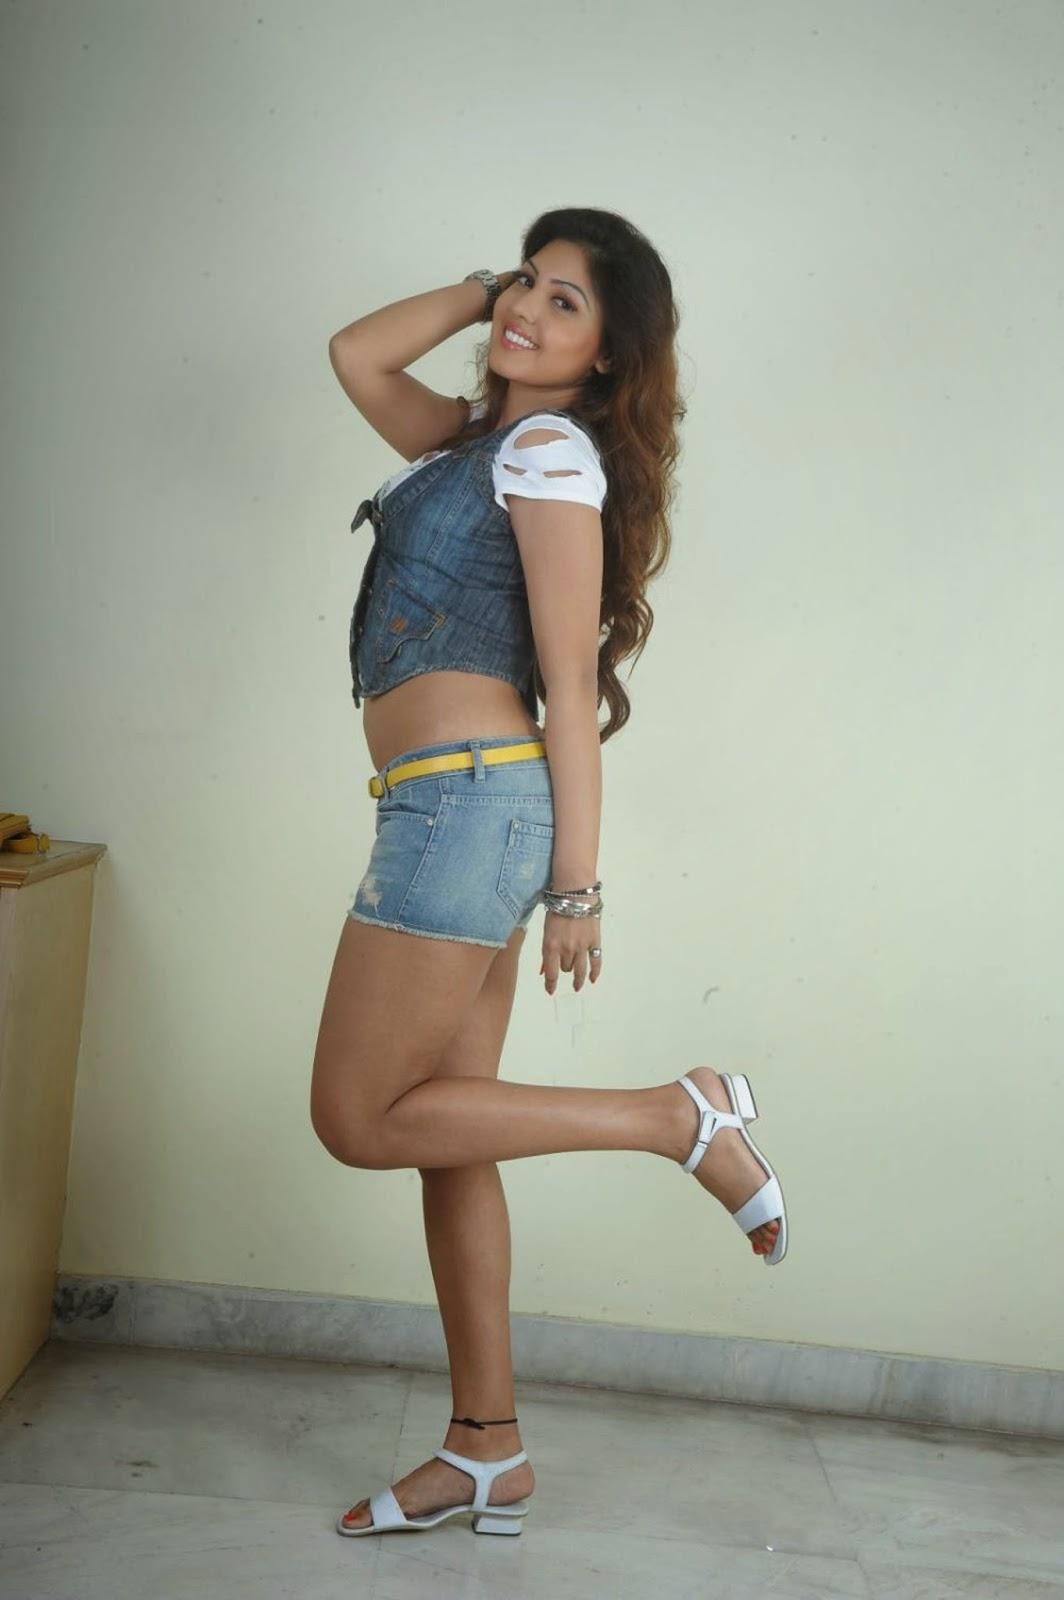 Komal jha jeanse short skirt hot wallpapers